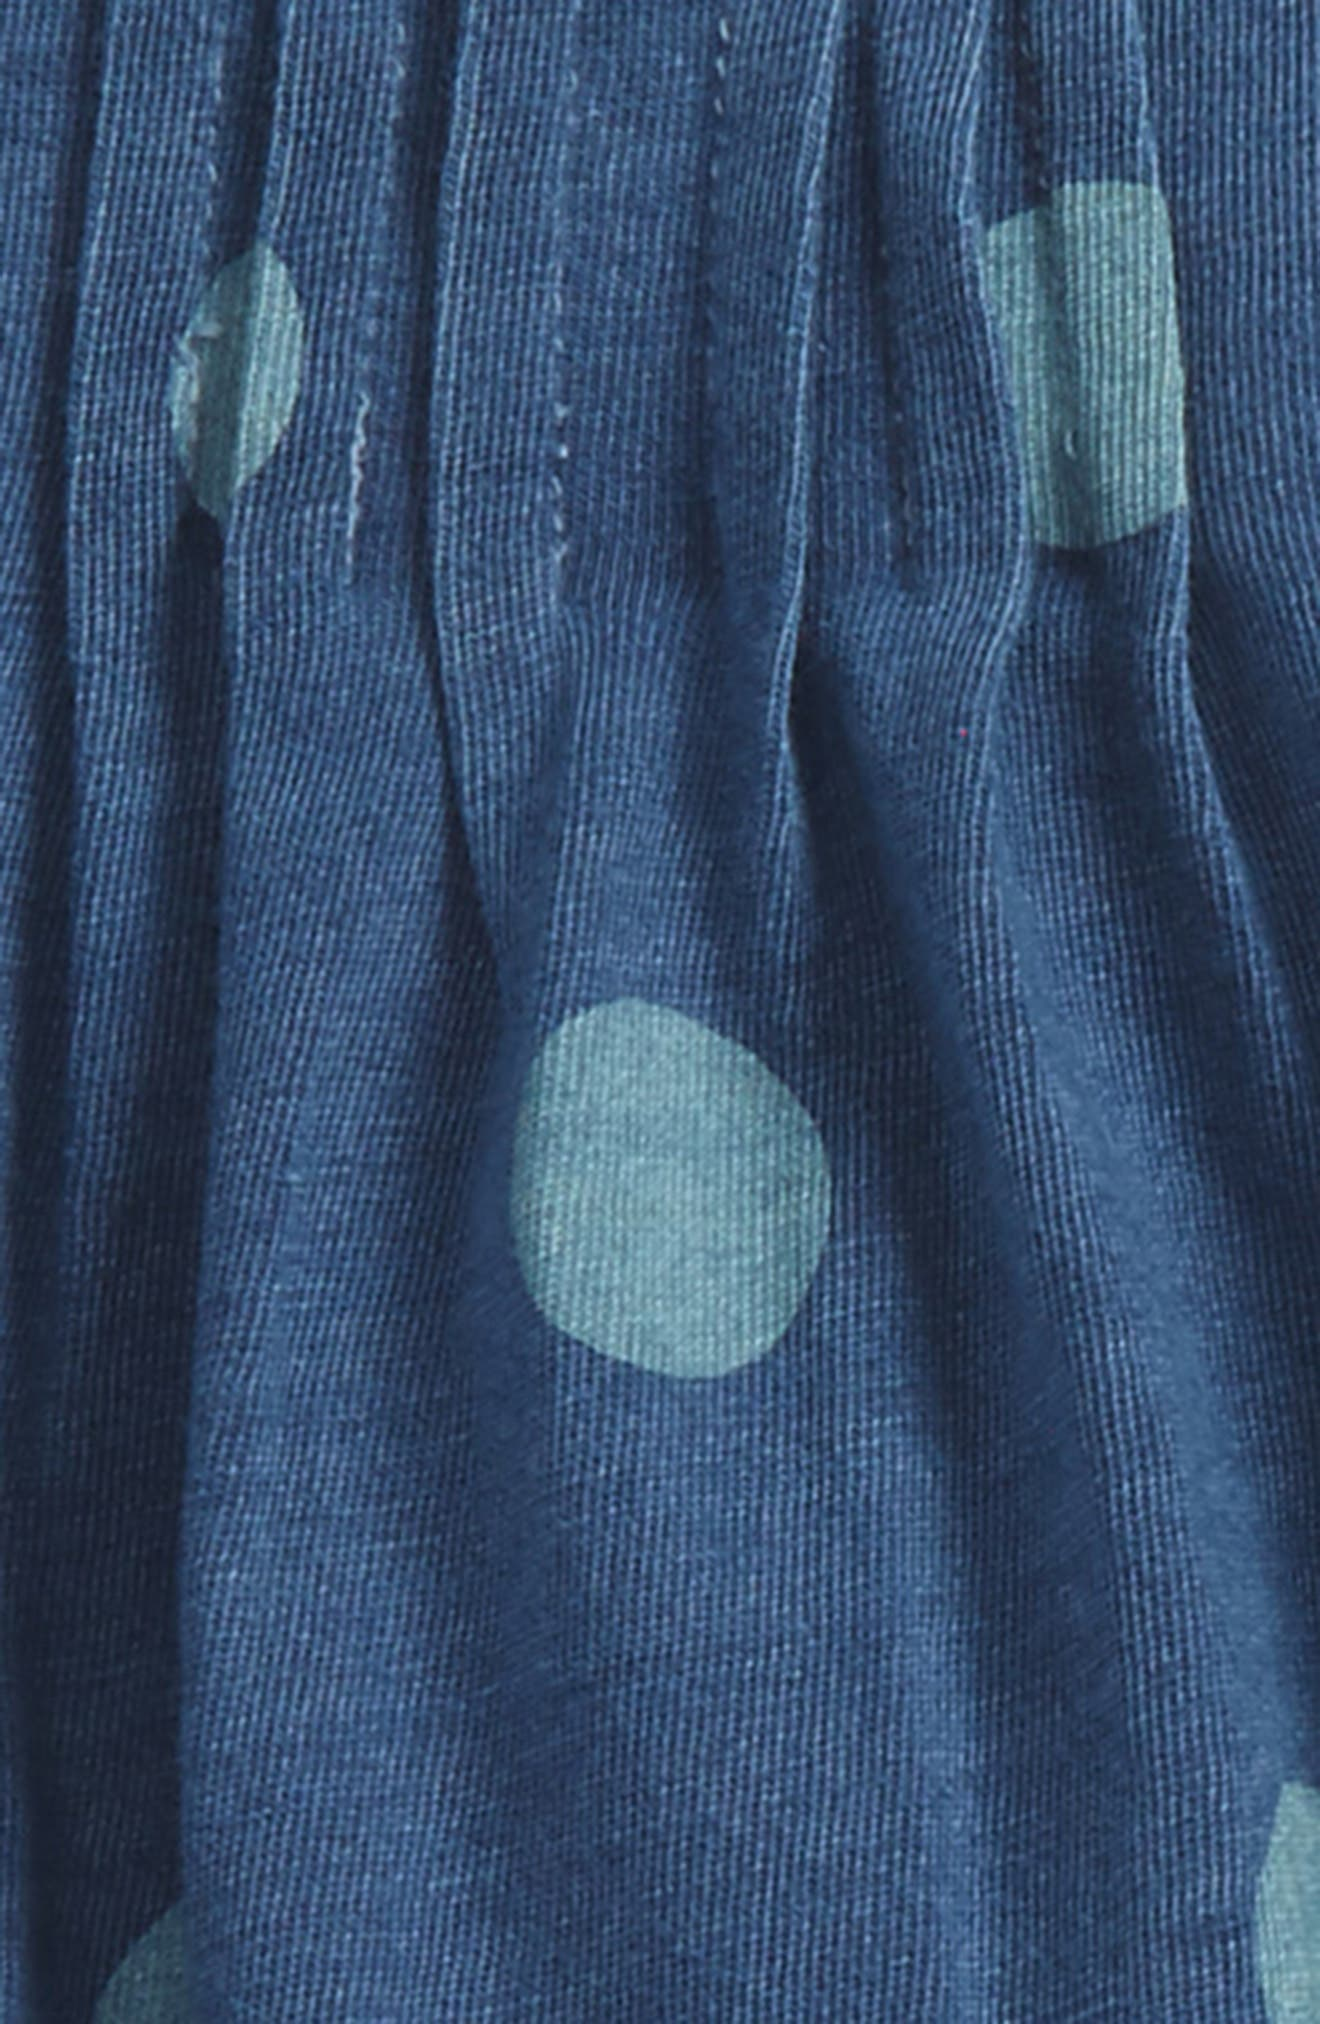 Tunic & Leggings Set,                             Alternate thumbnail 2, color,                             Blue Indigo Dot